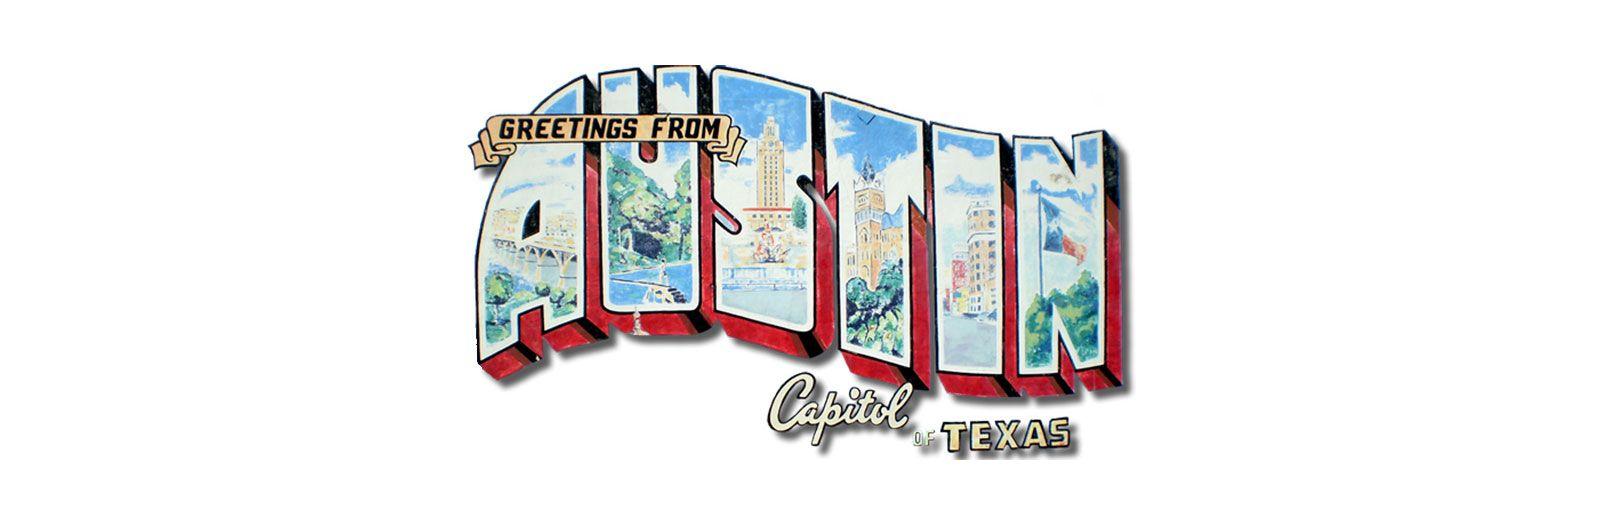 Austin Printing Company